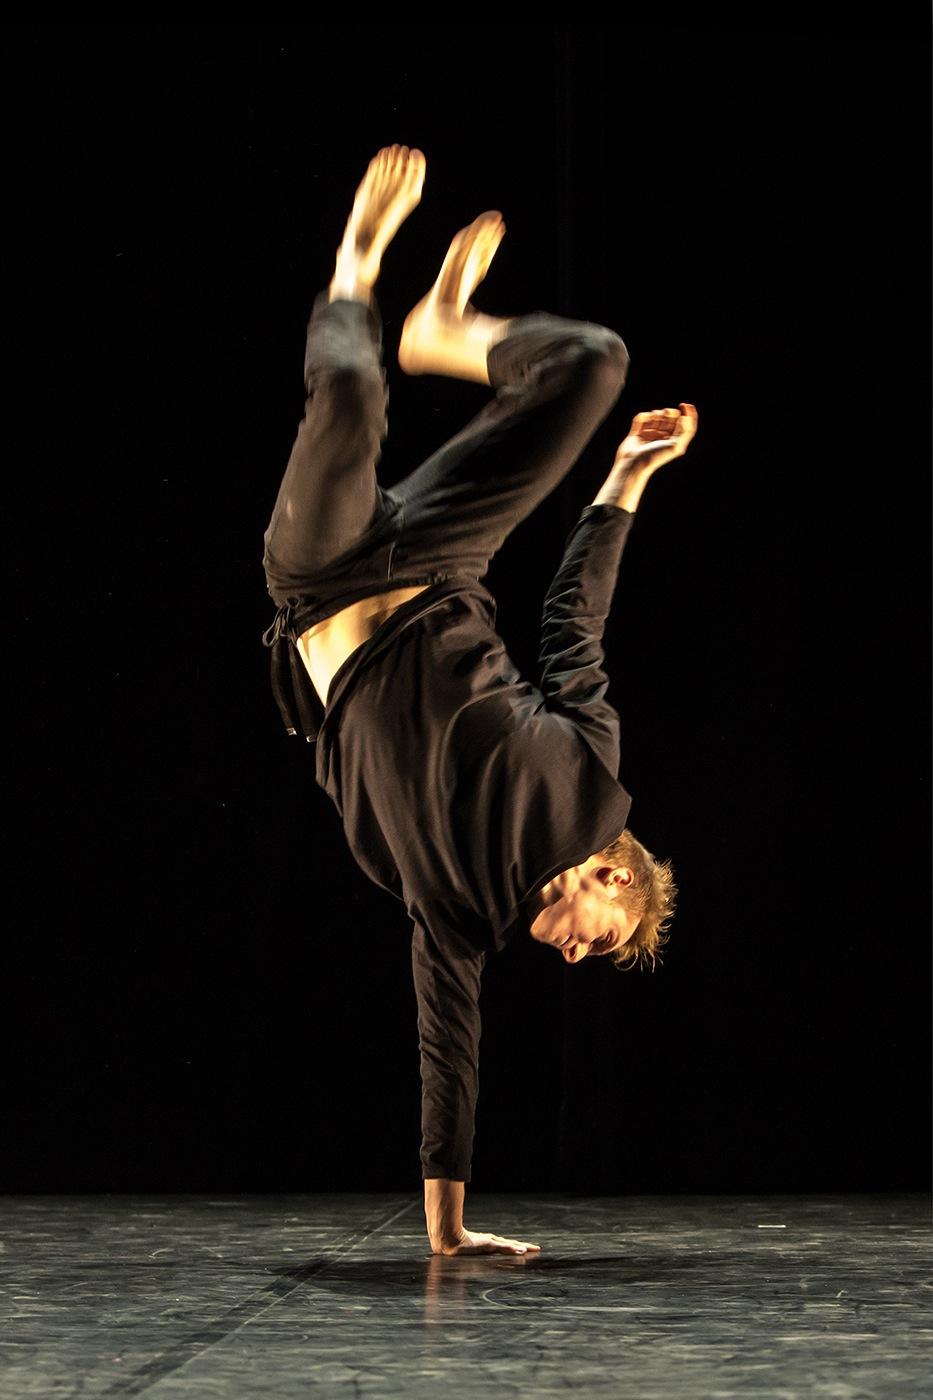 photographe-reportage-danse-avec-ton-crous-guillaume-heraud-033-small